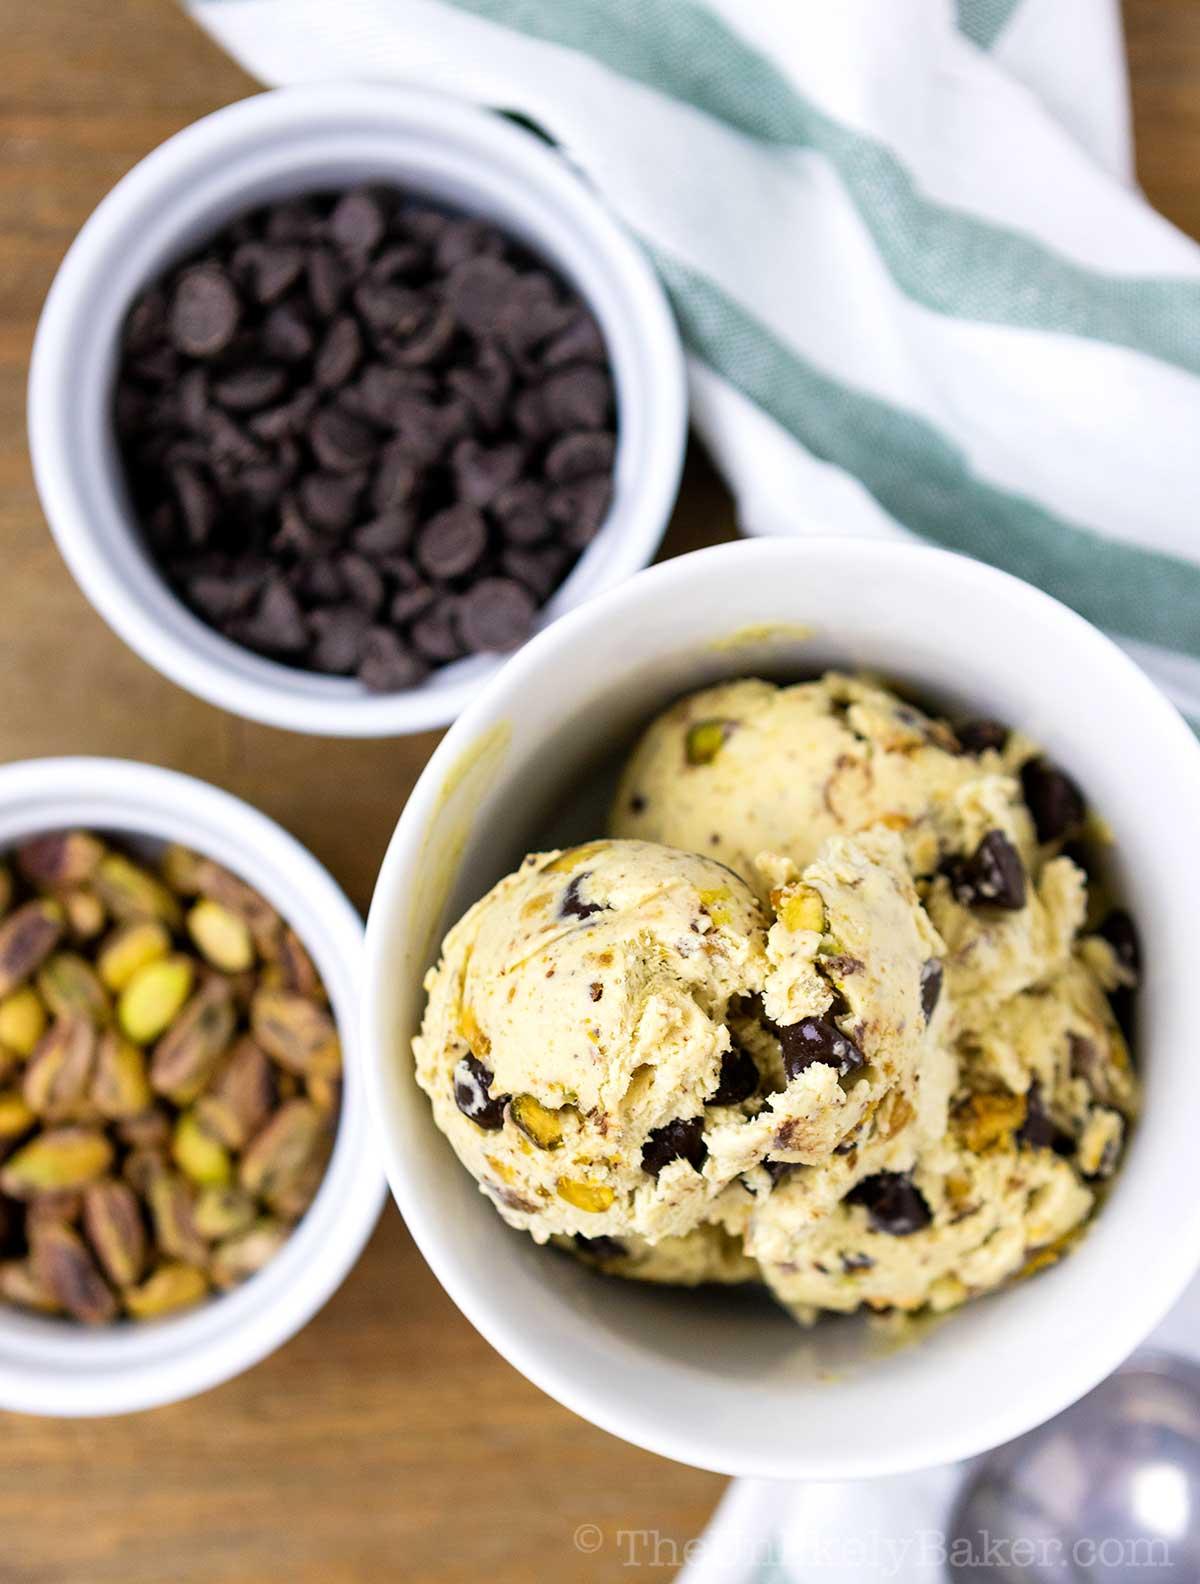 Homemade Pistachio Chocolate Chip Ice Cream